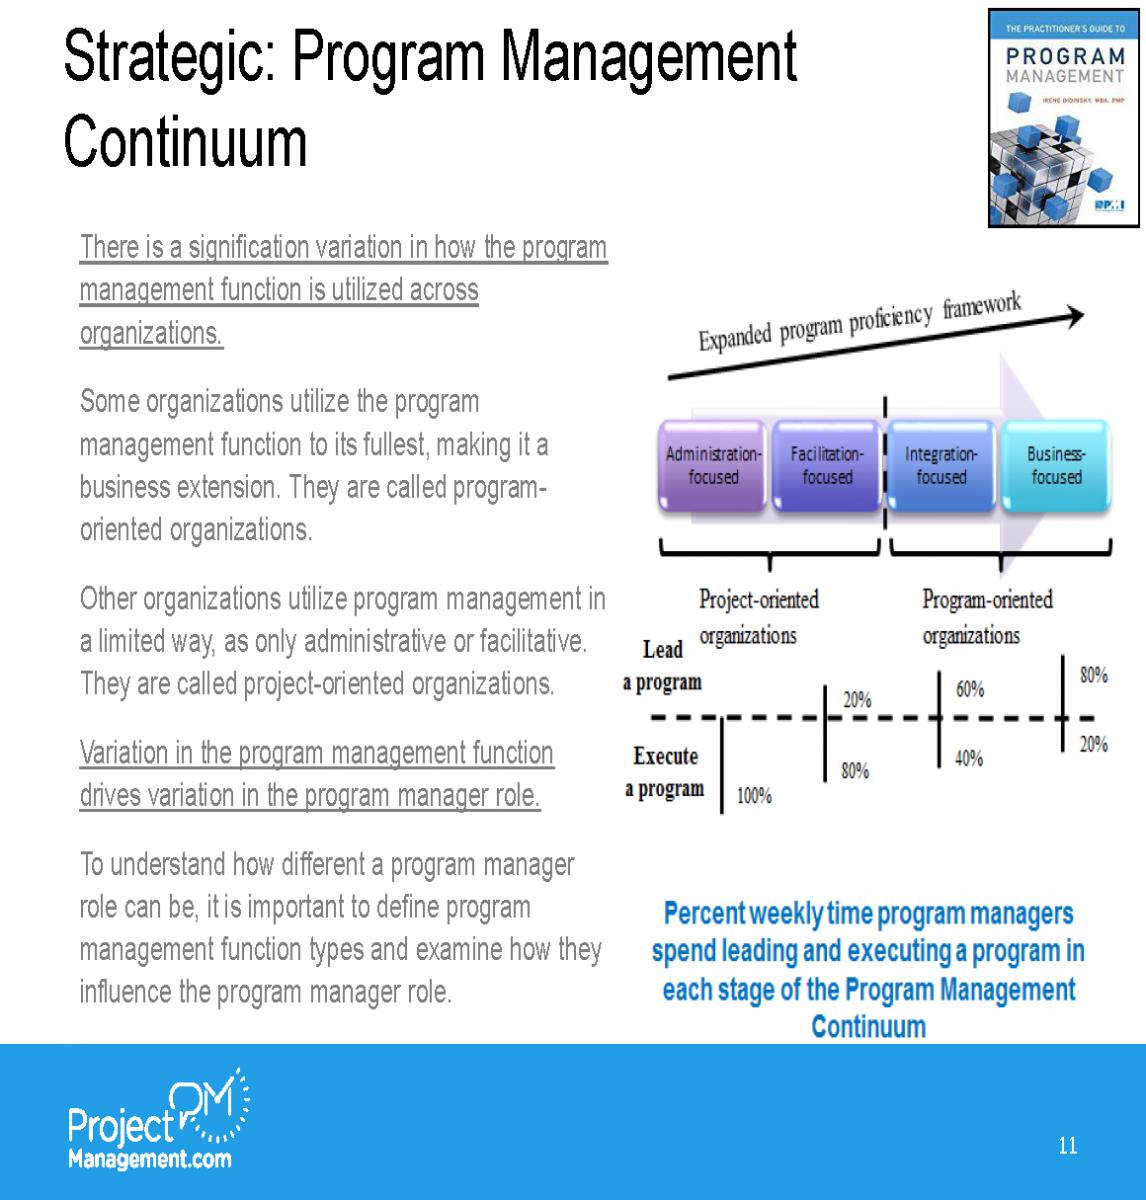 ProjectManagementcom webinar_Irene Didinsky_05112018_FinalFinal_Page_15